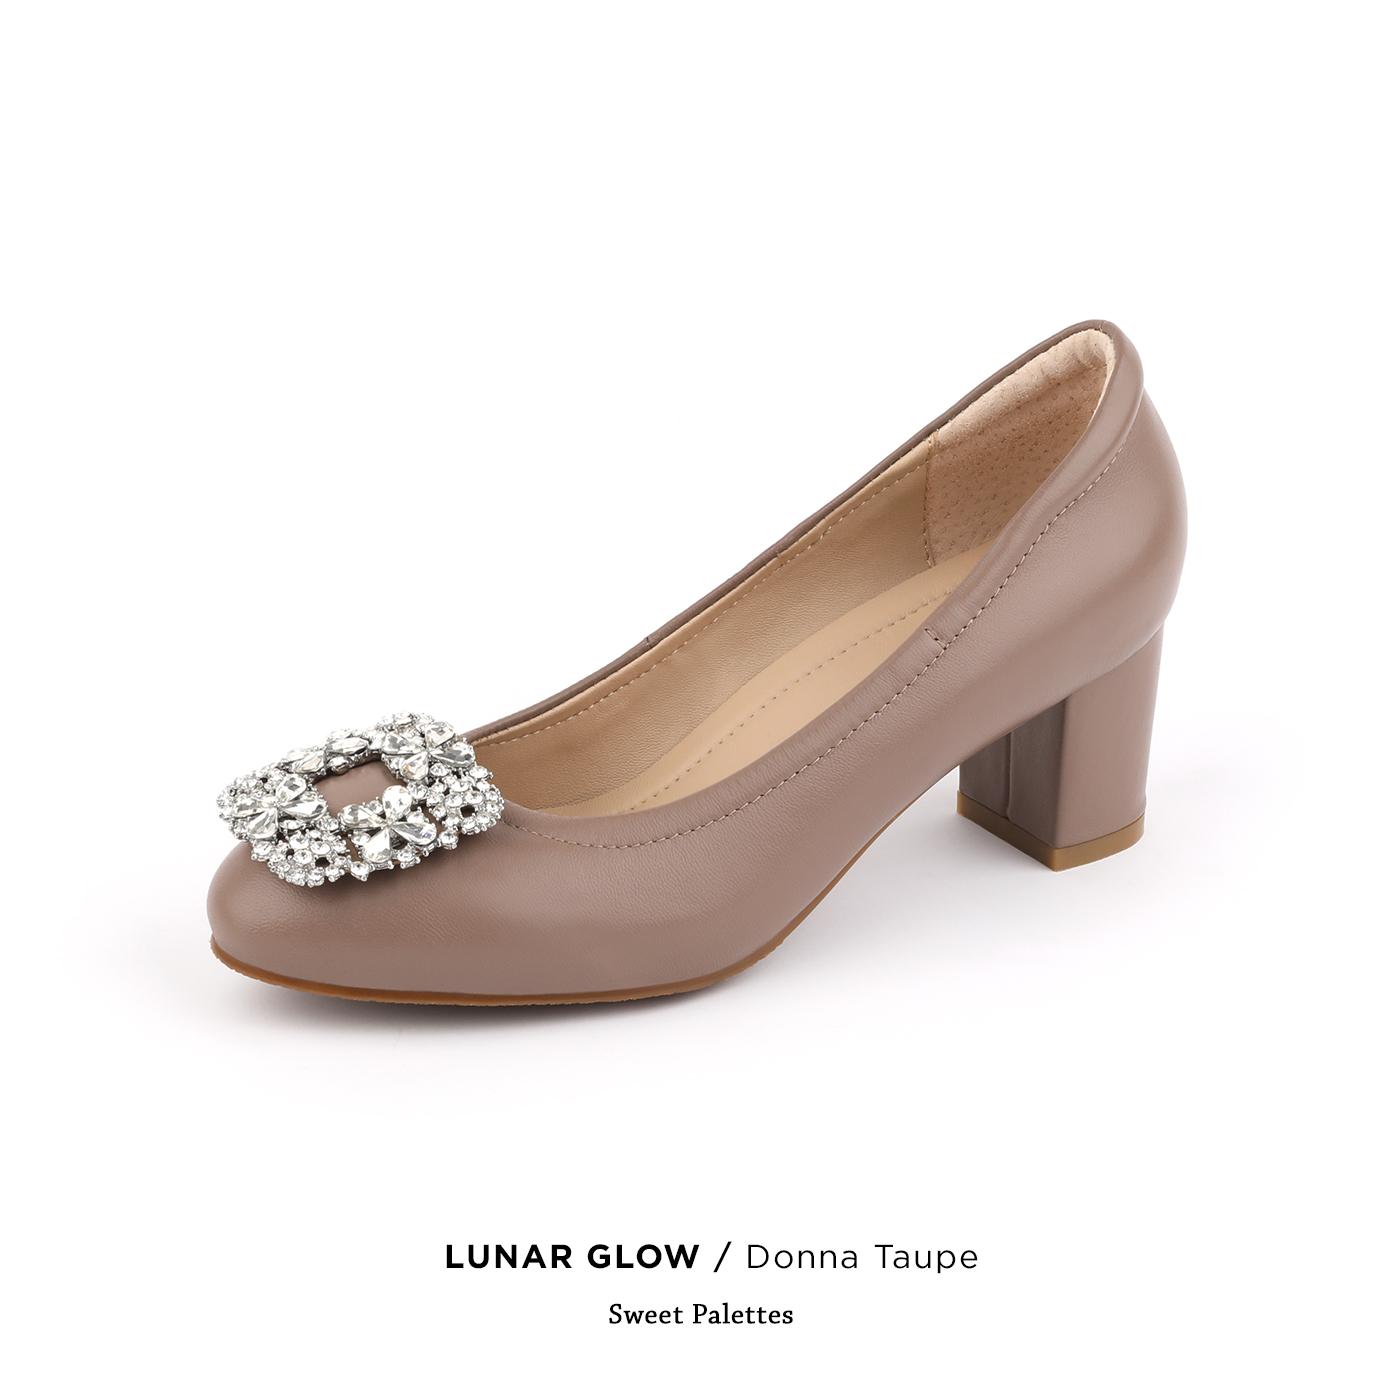 Lunar Glow Donna Taupe